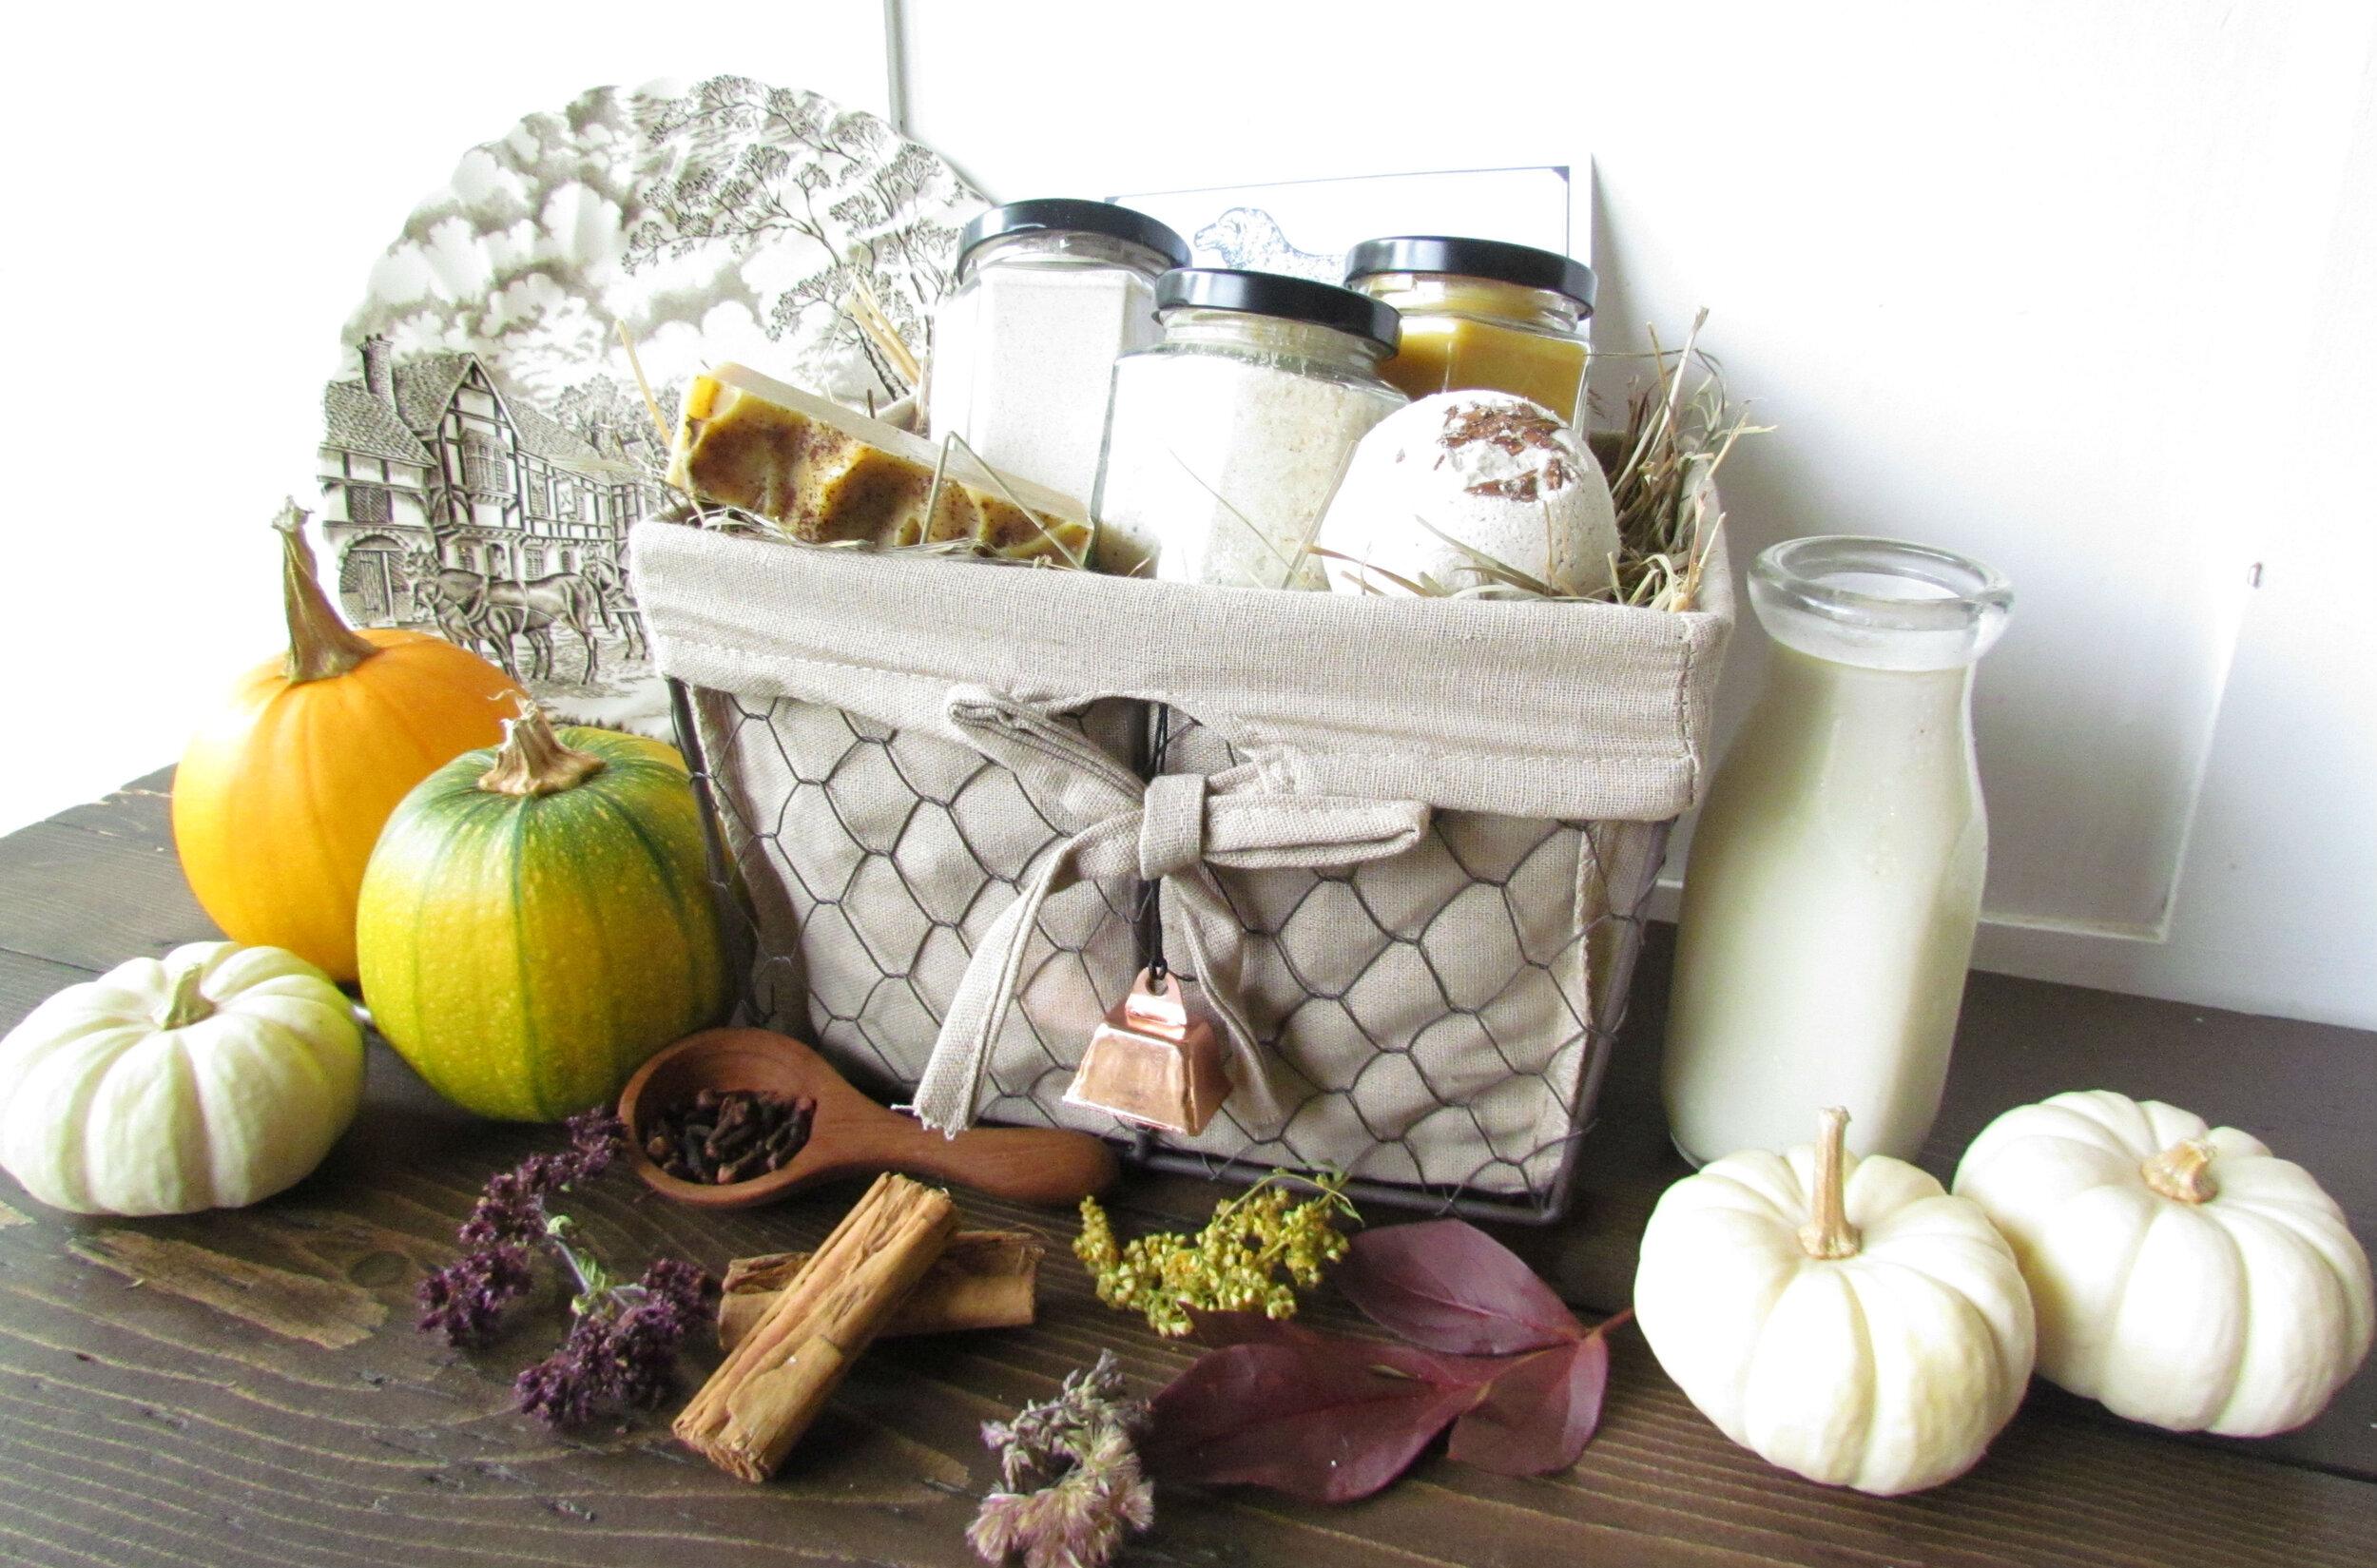 Comforting Autumn spice sheep milk gift basket